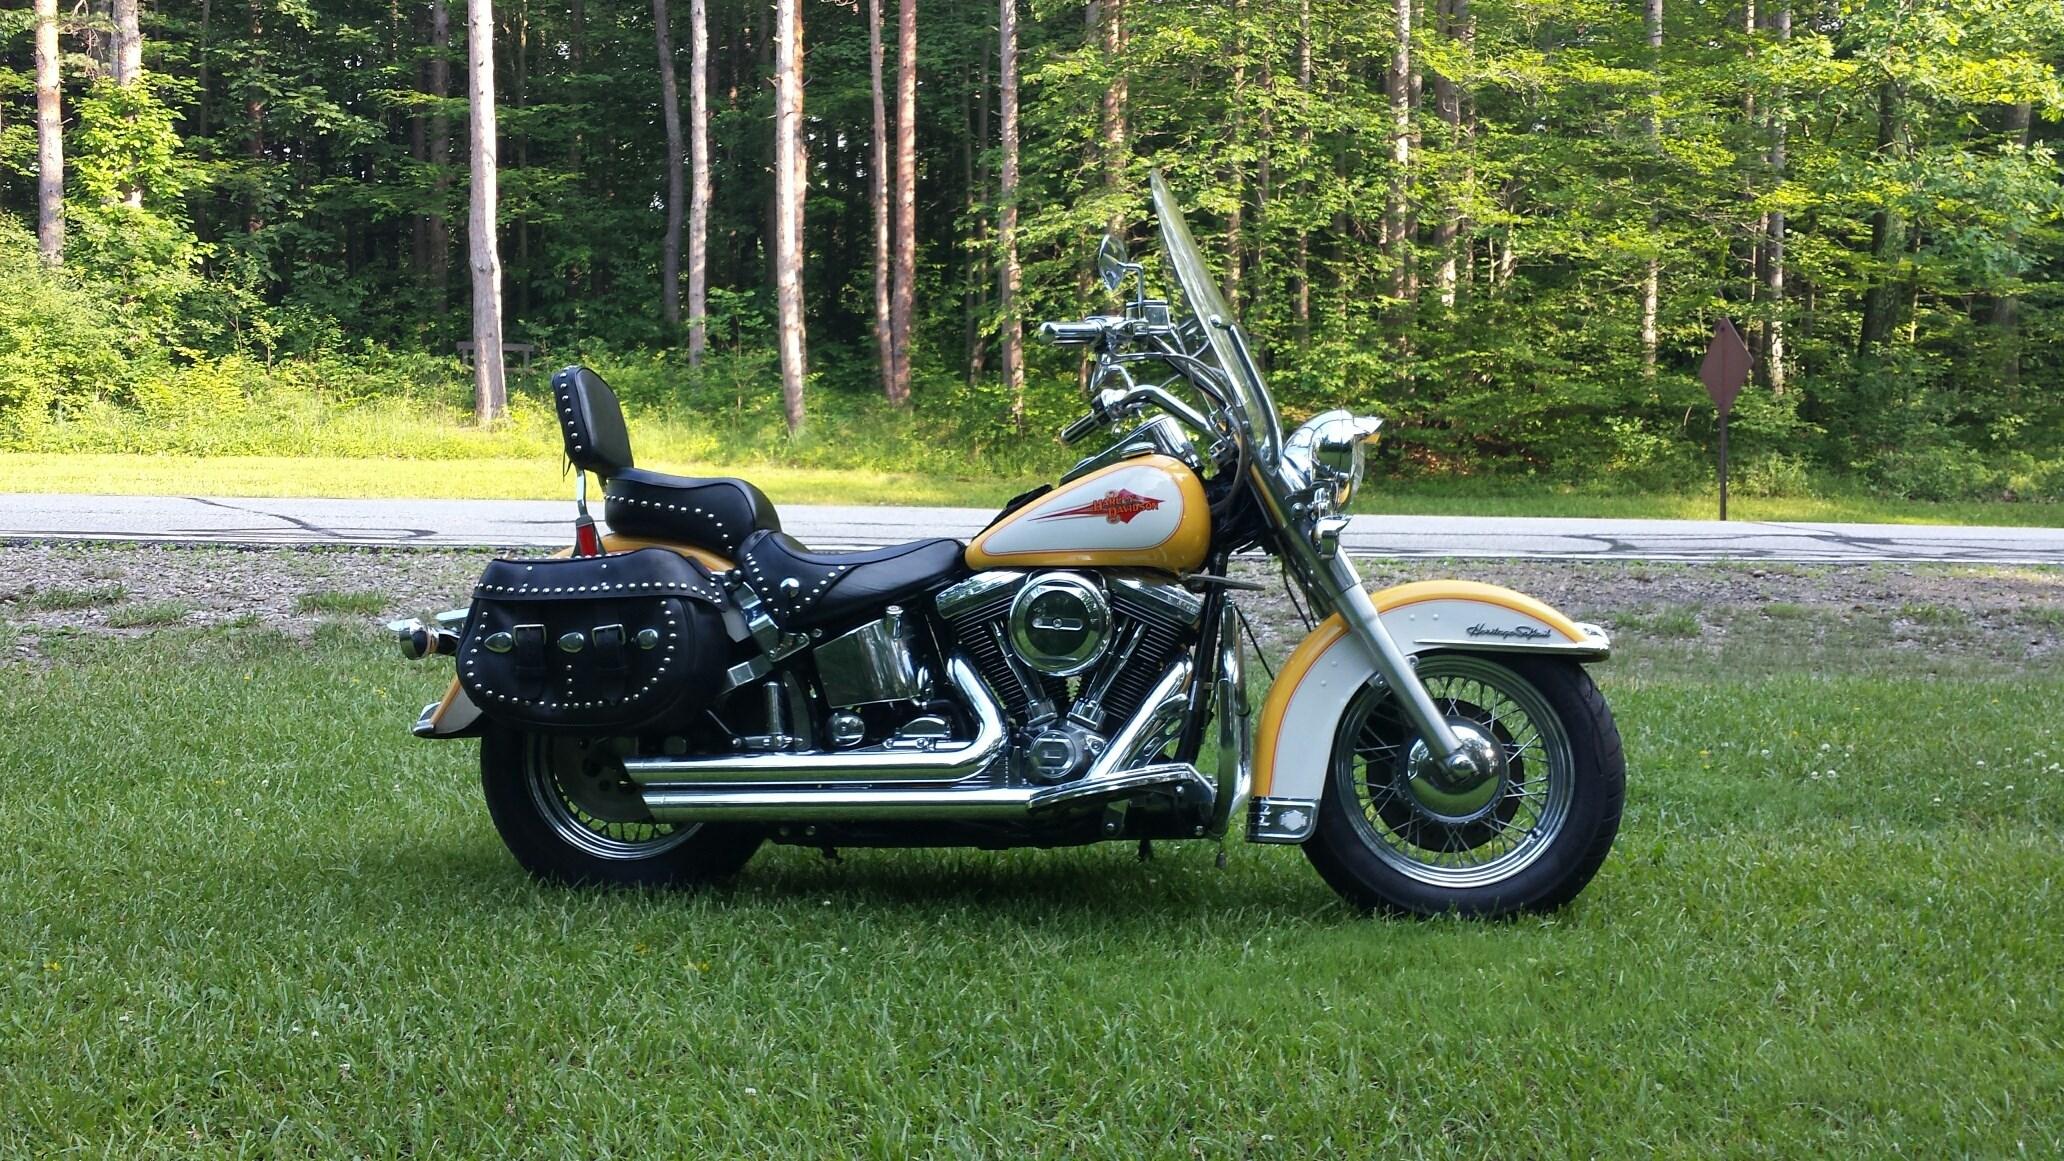 1995 Harley Davidson 174 Flstc Heritage Softail 174 Classic